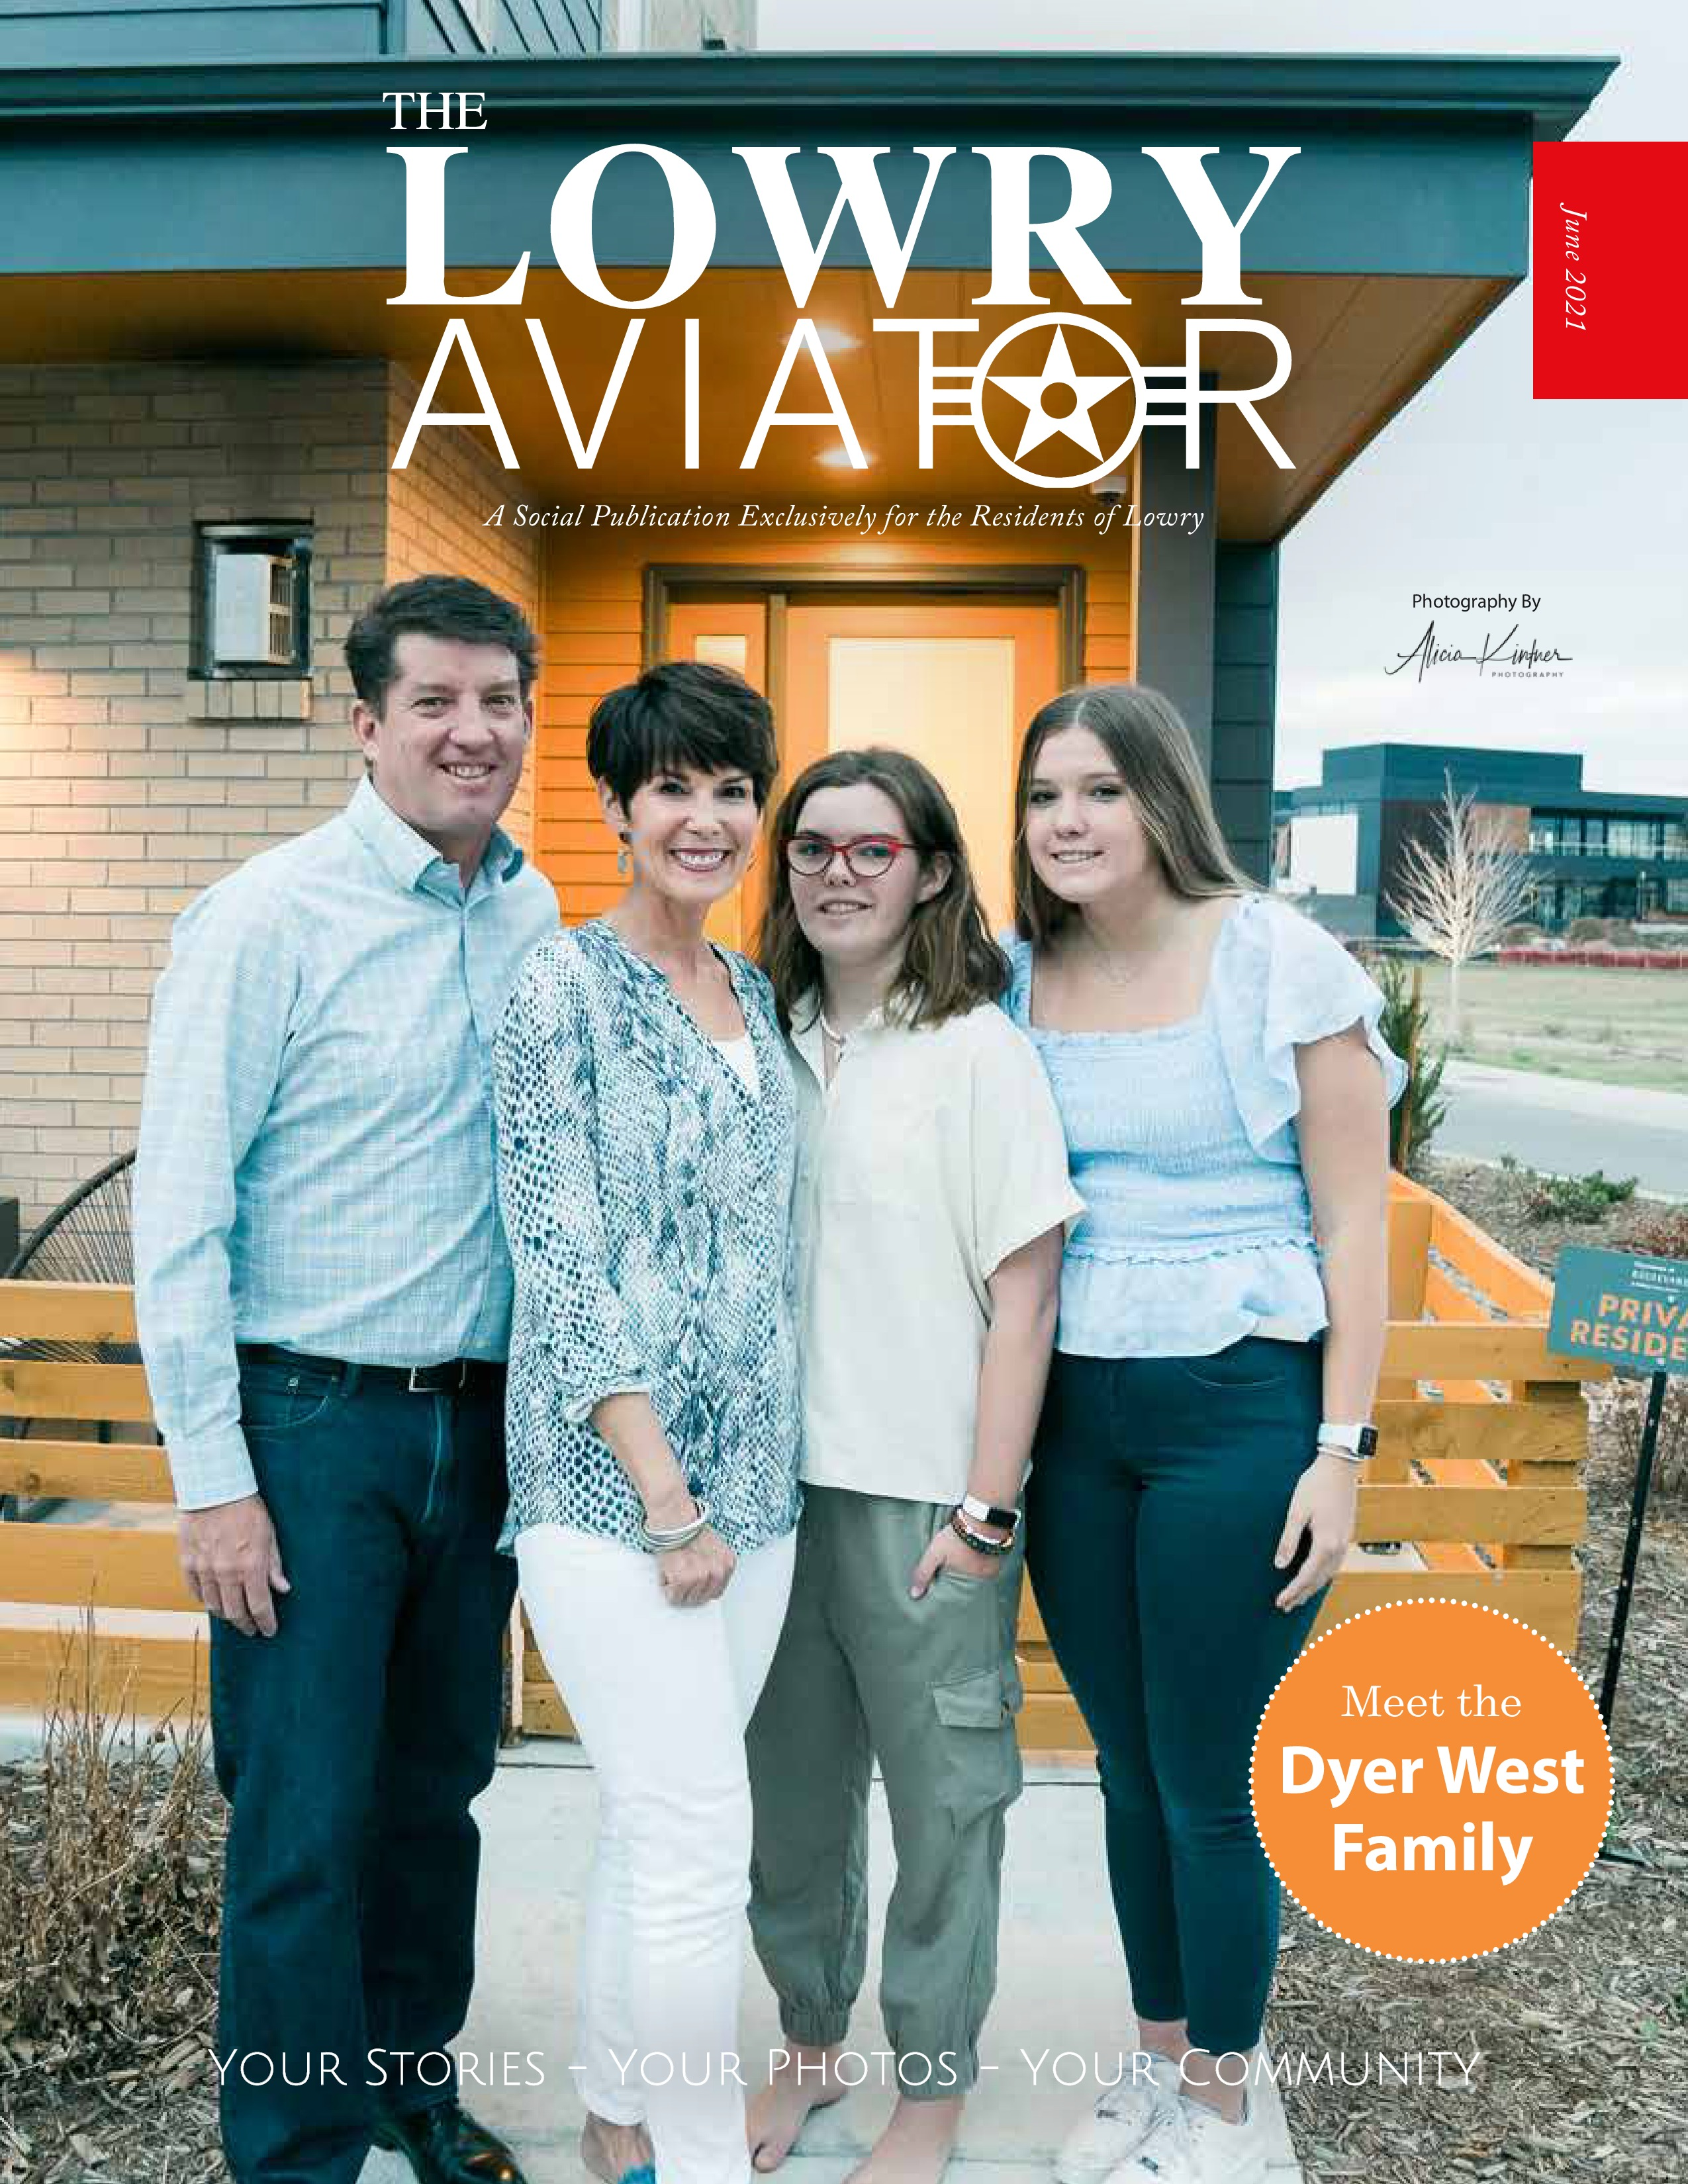 Lowry Aviator 2021-06-01